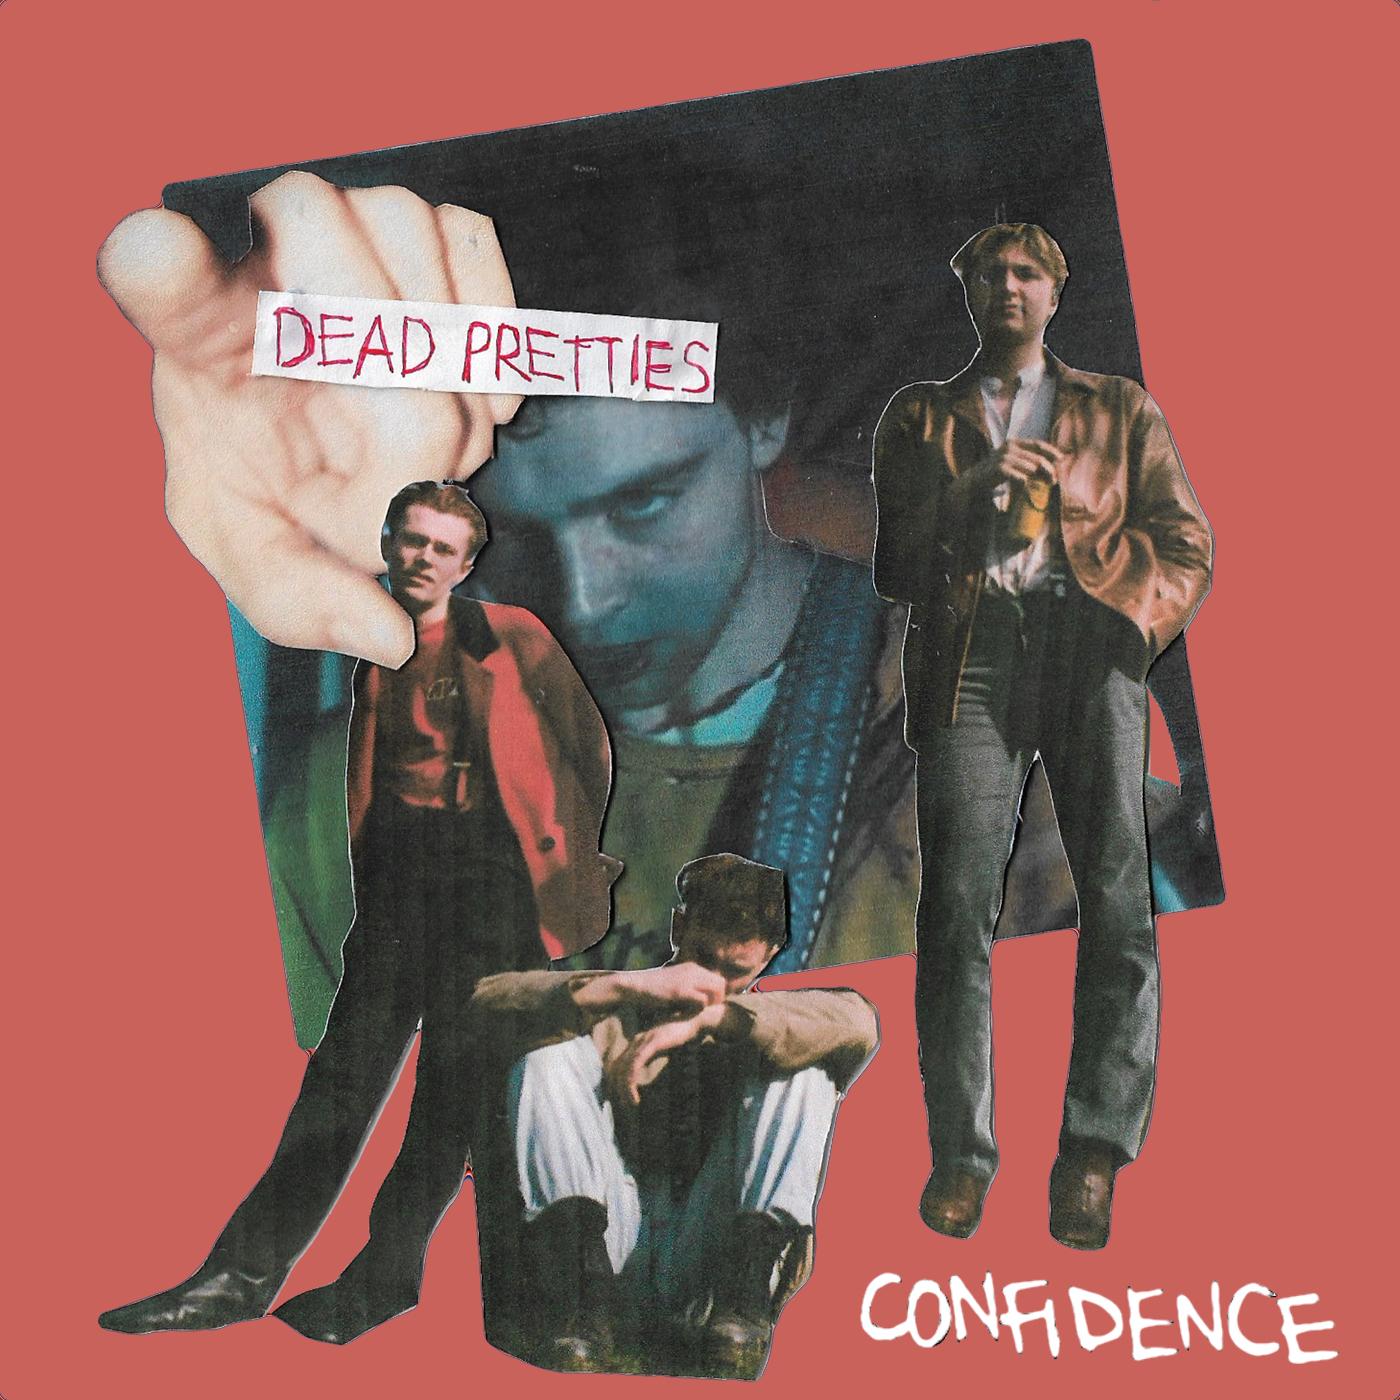 BSR003 - DEAD PRETTIES - CONFIDENCE